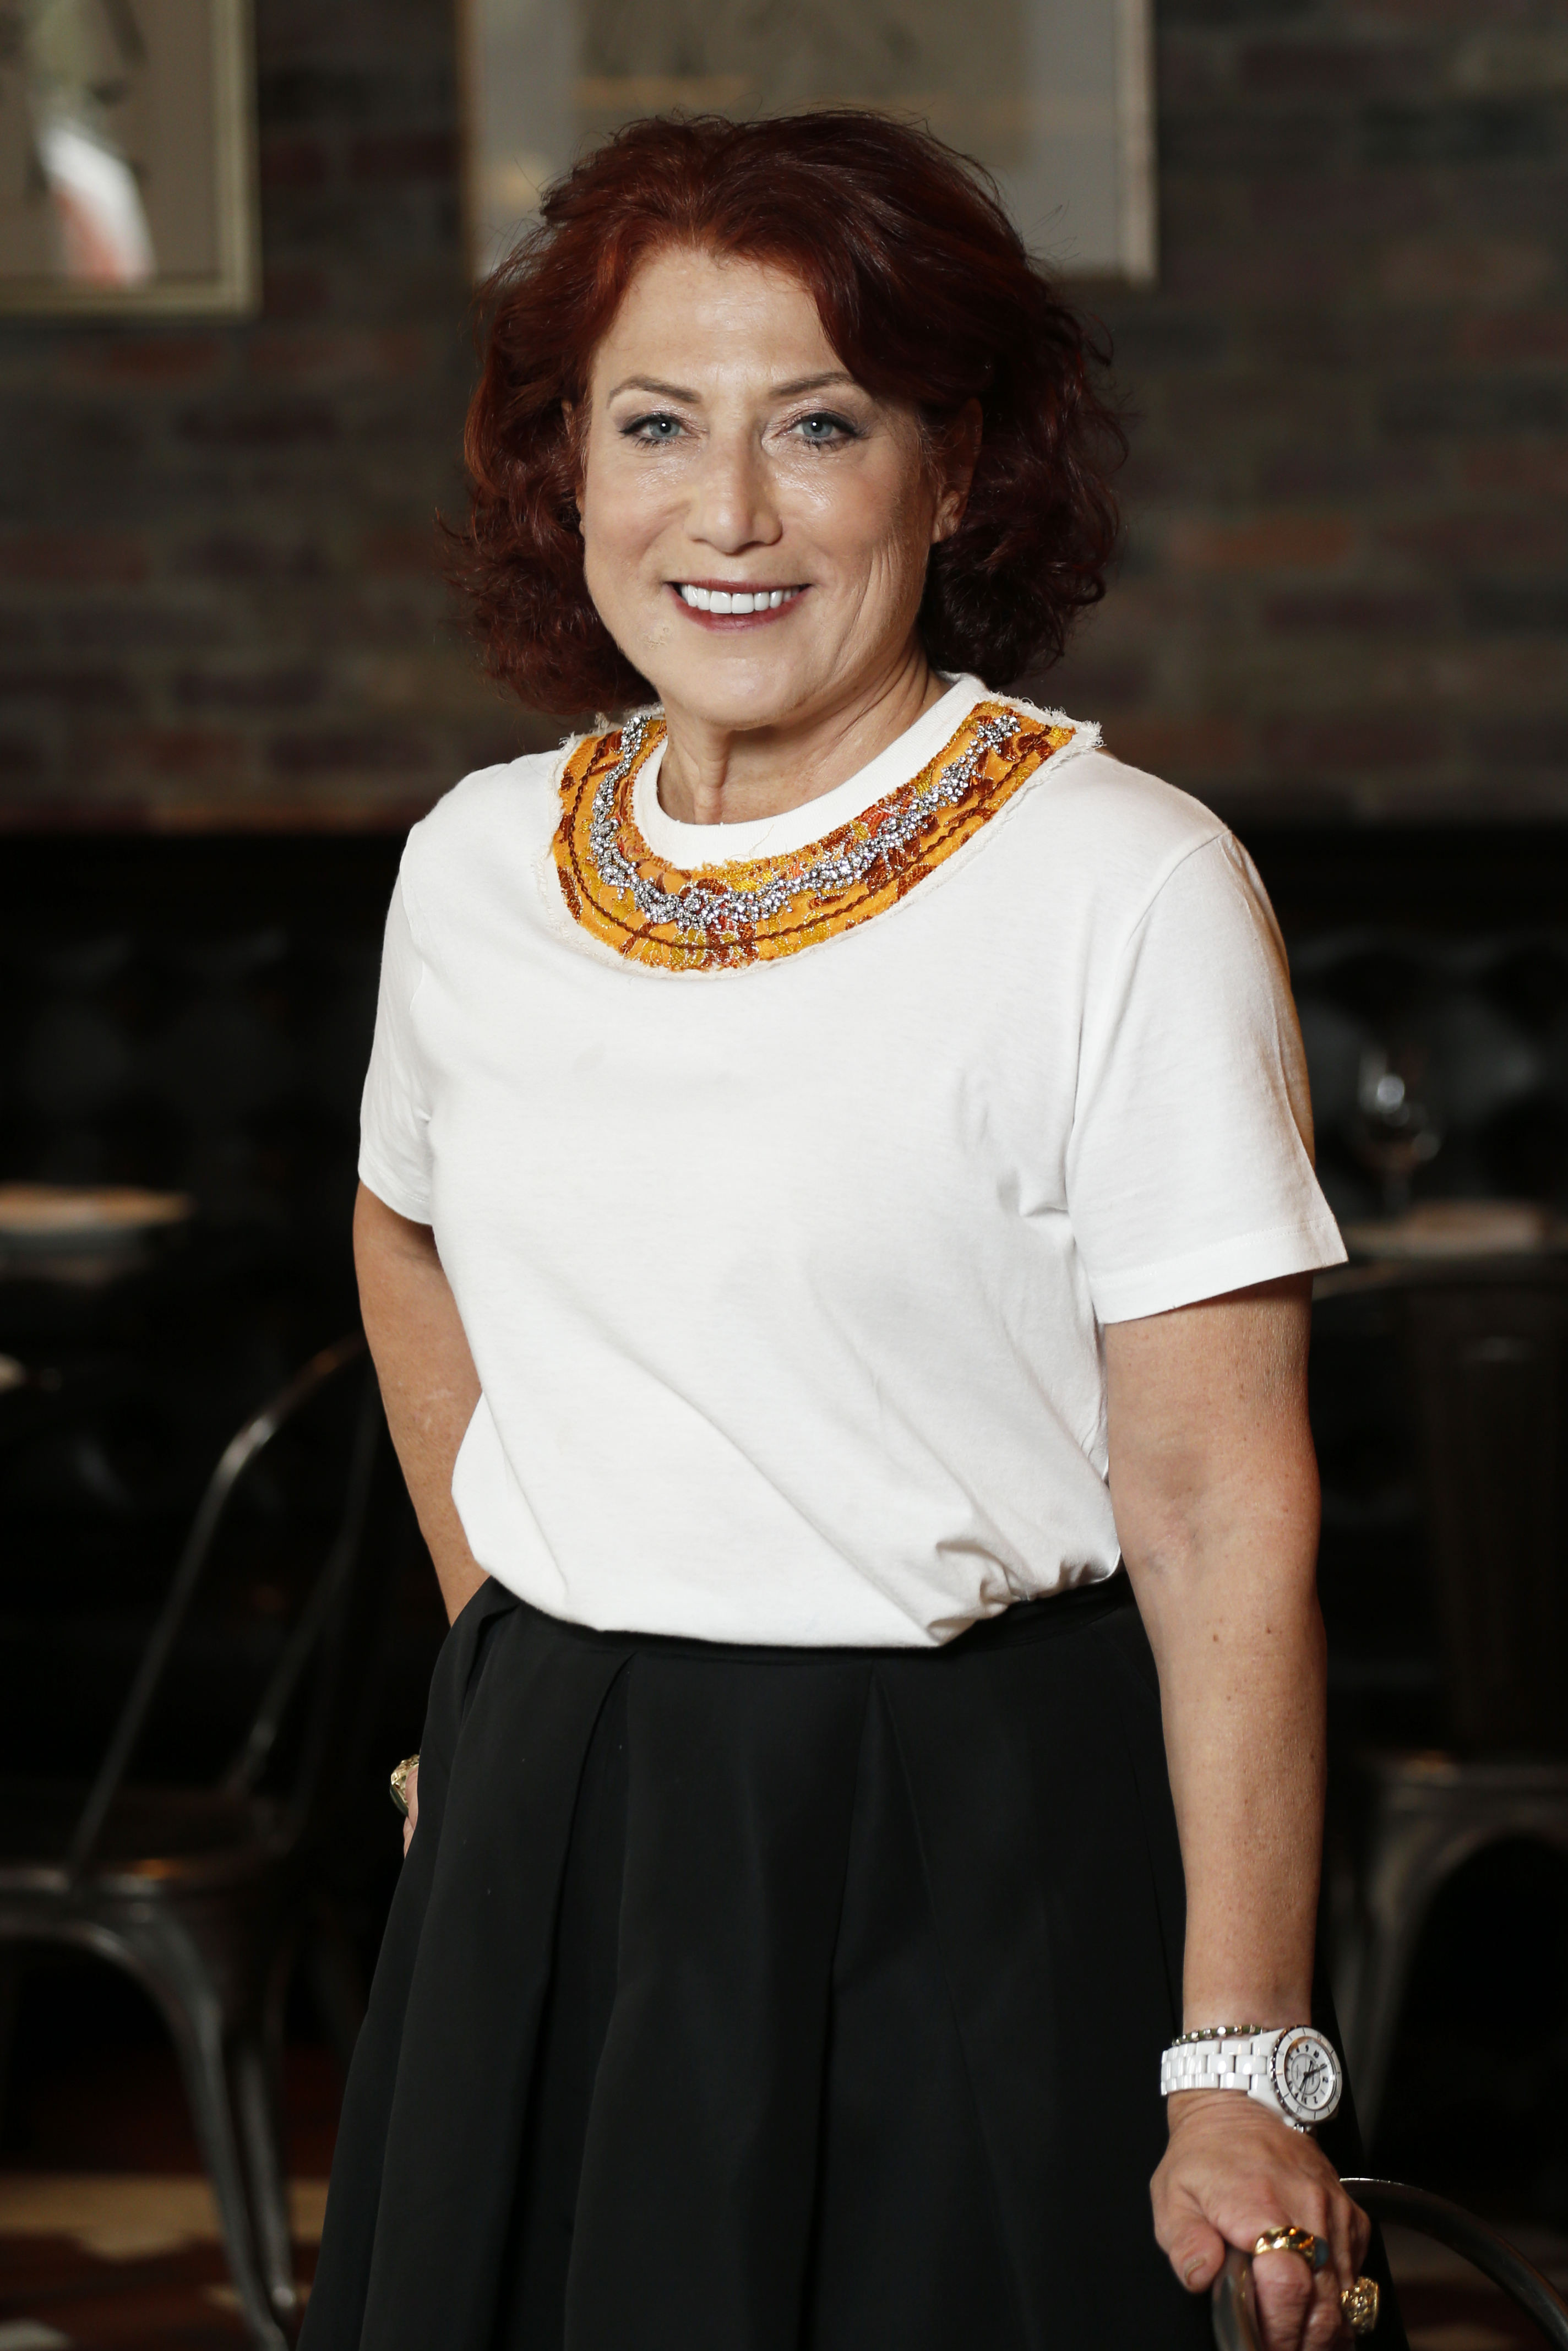 Marcy Blum